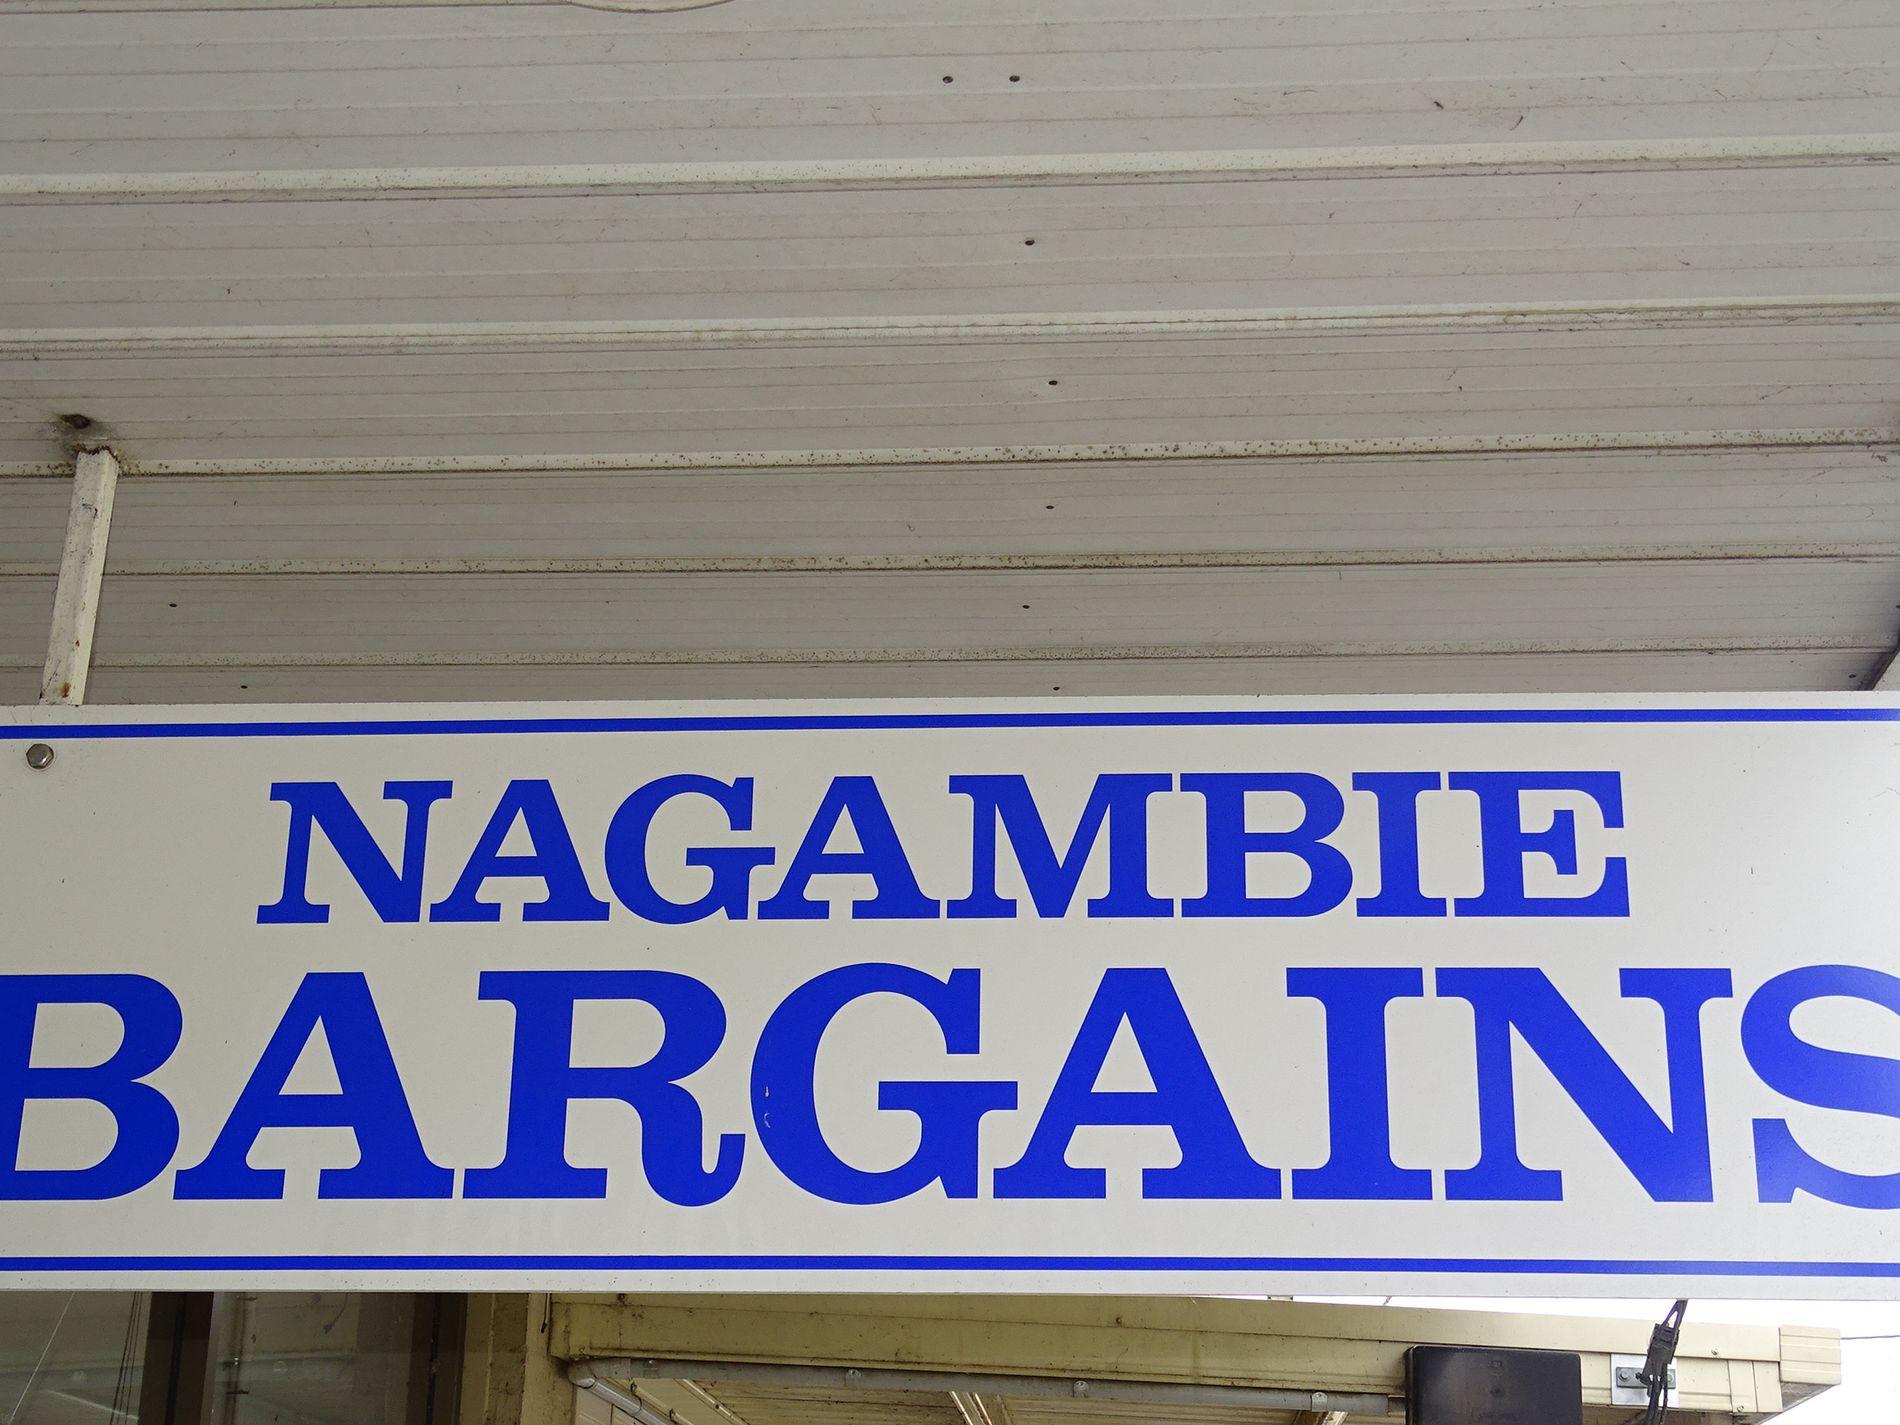 Nagambie Bargains